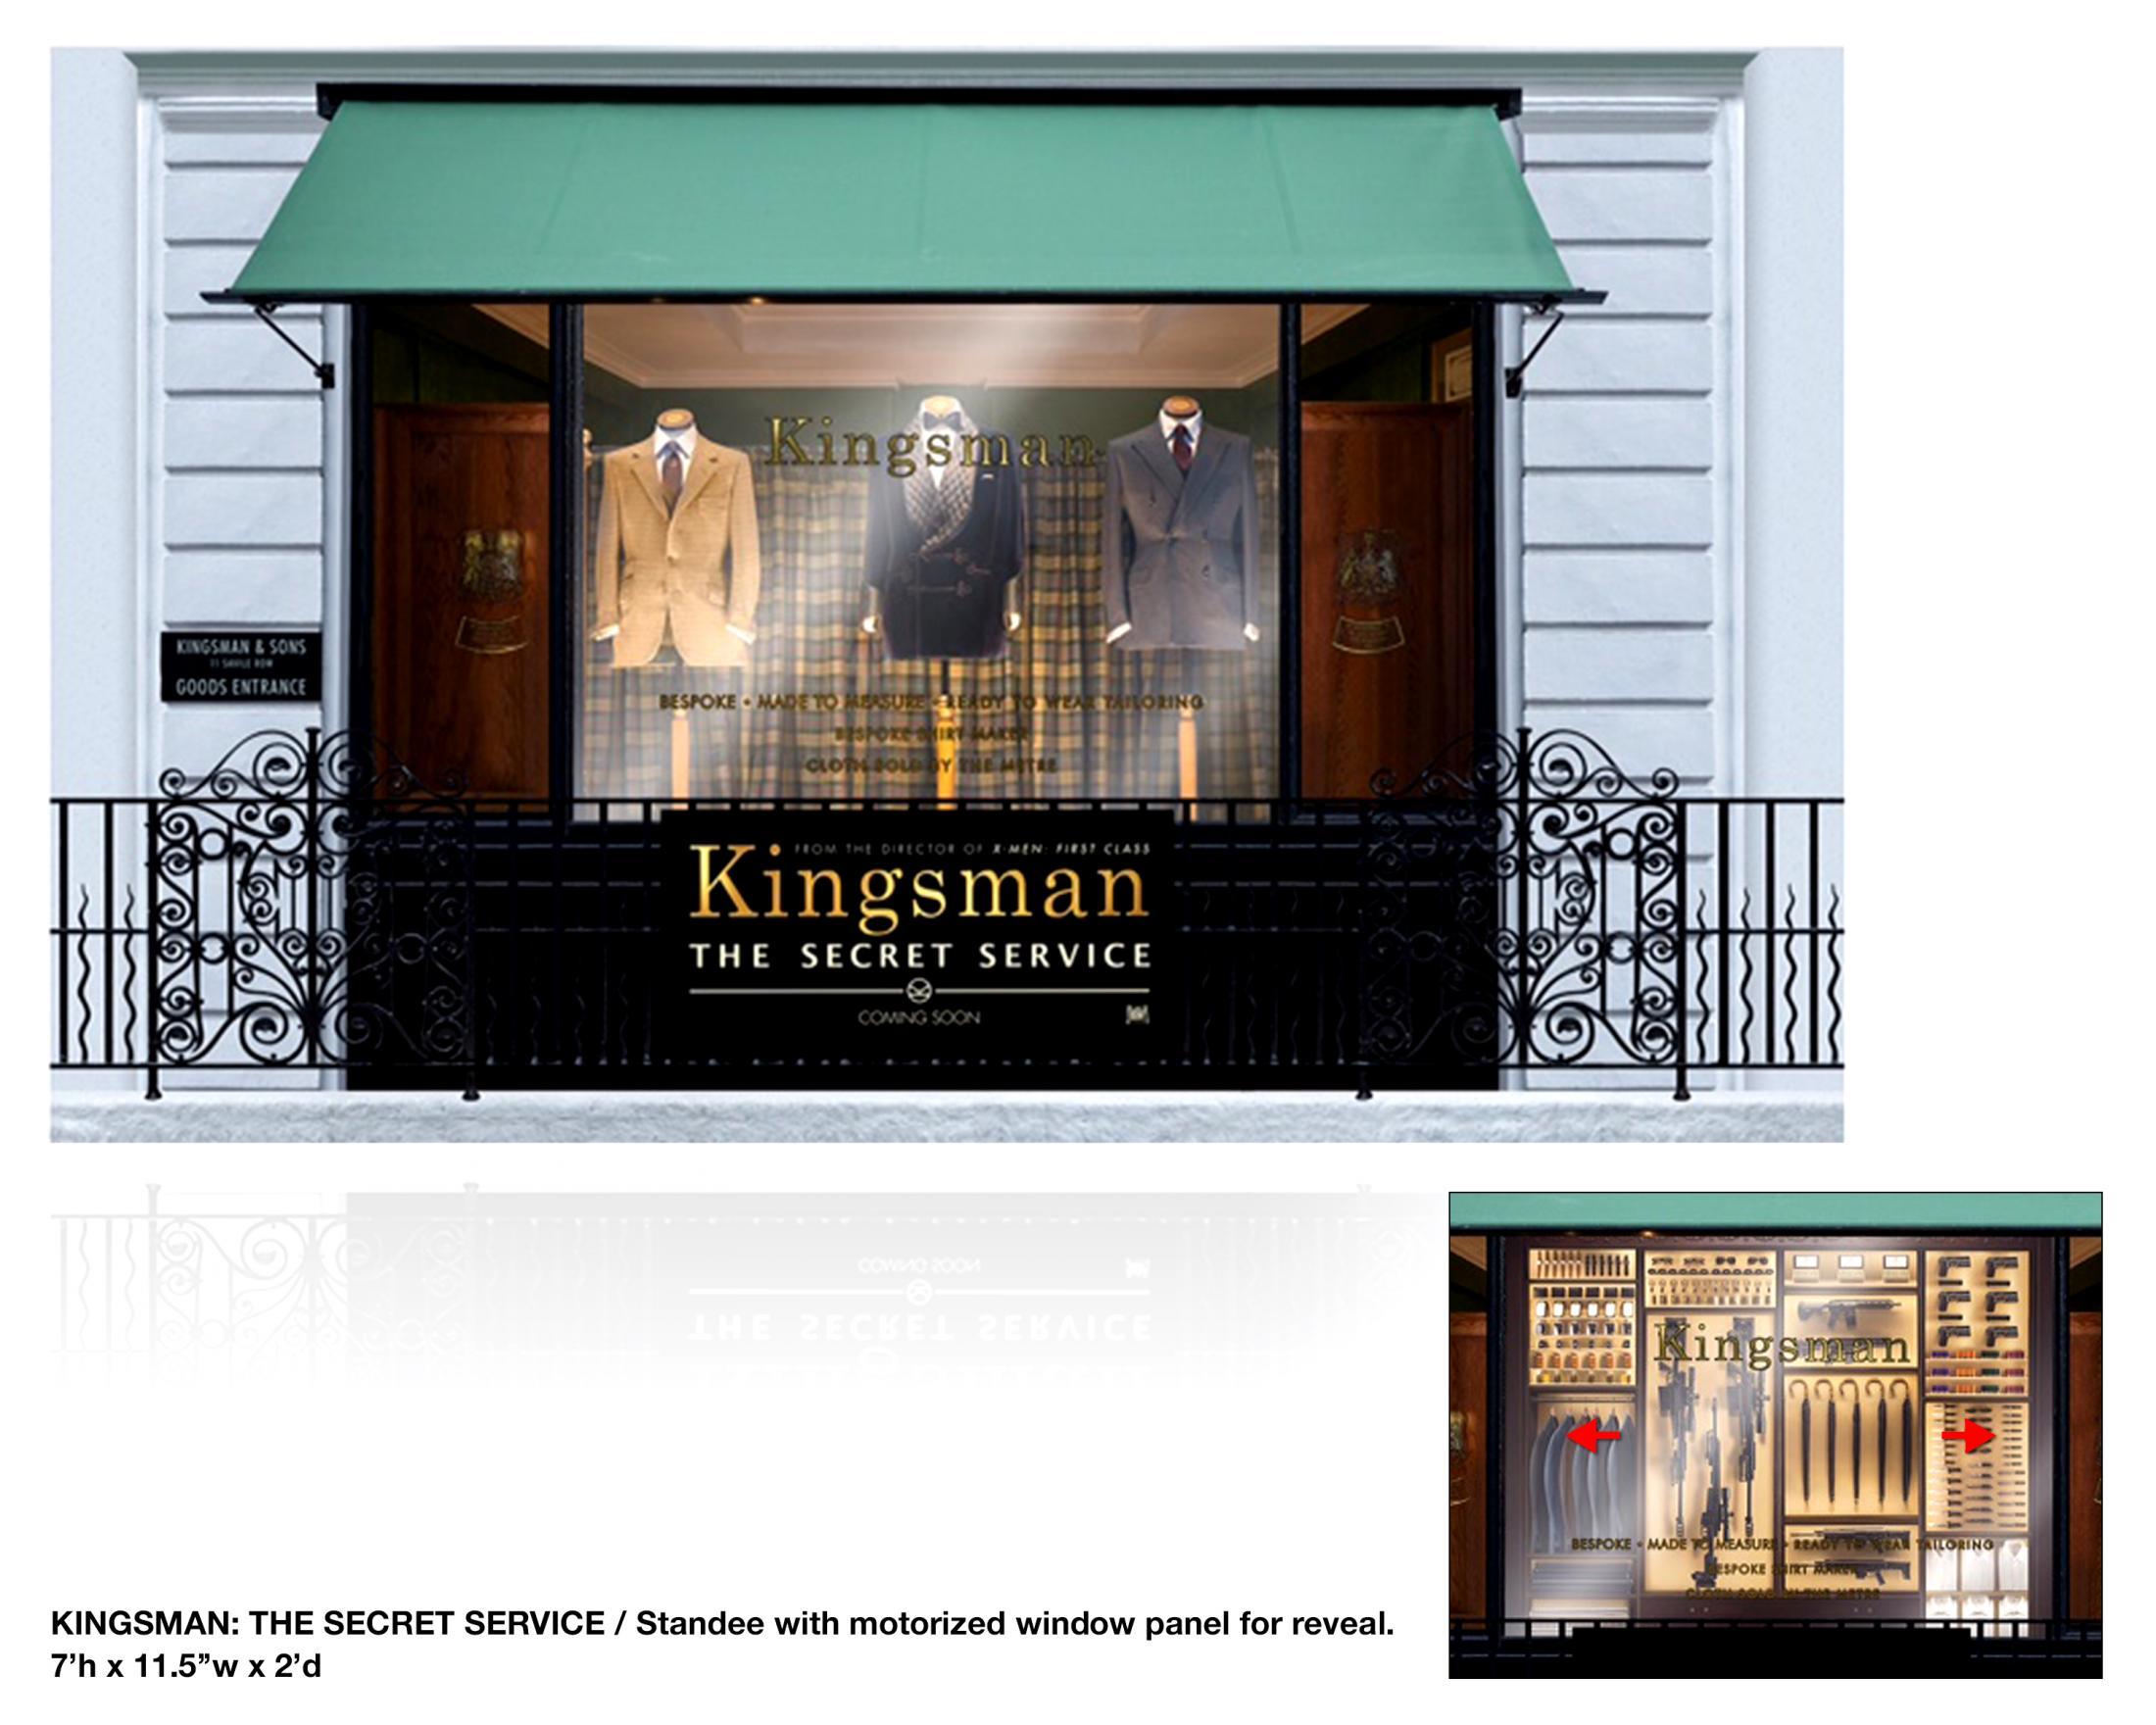 Thumbnail for Kingsman: The Secret Service